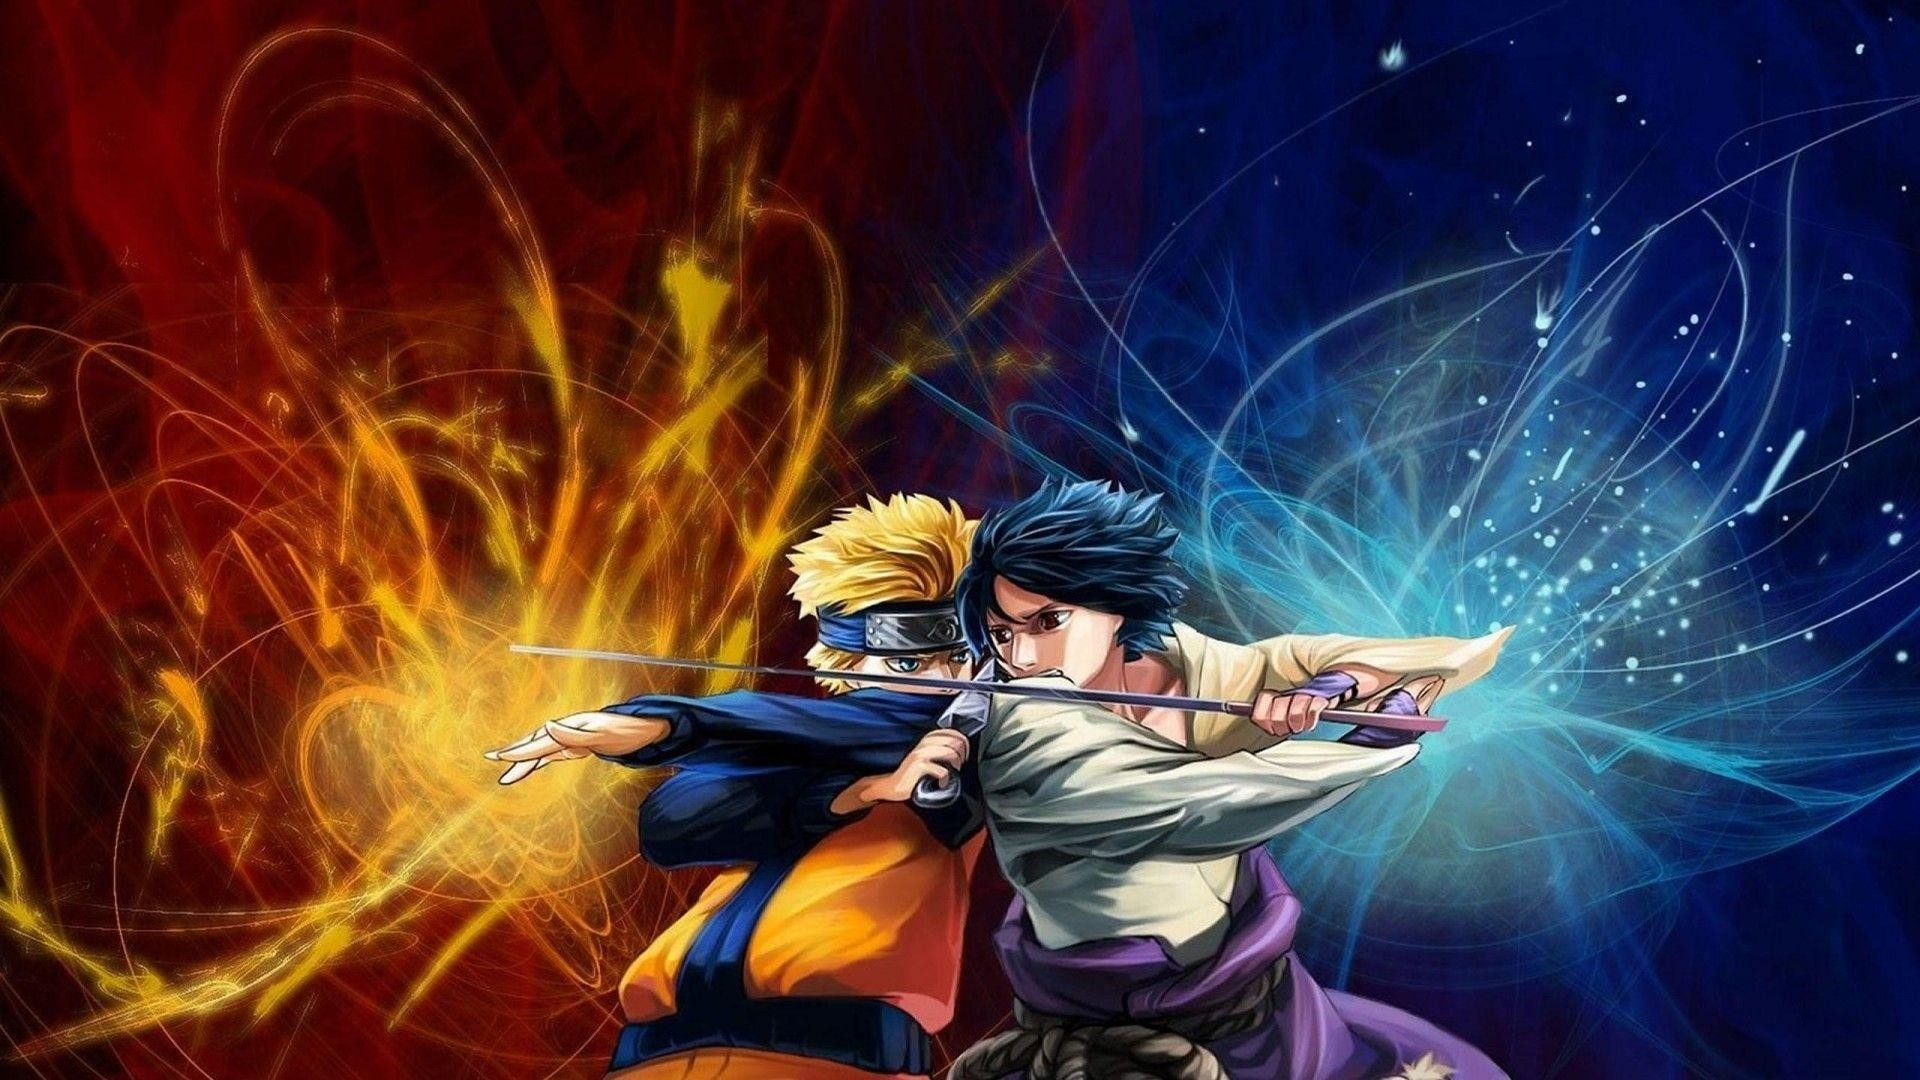 Naruto Sasuke Hd Wallpaper #997 Wallpaper | kariswall.com